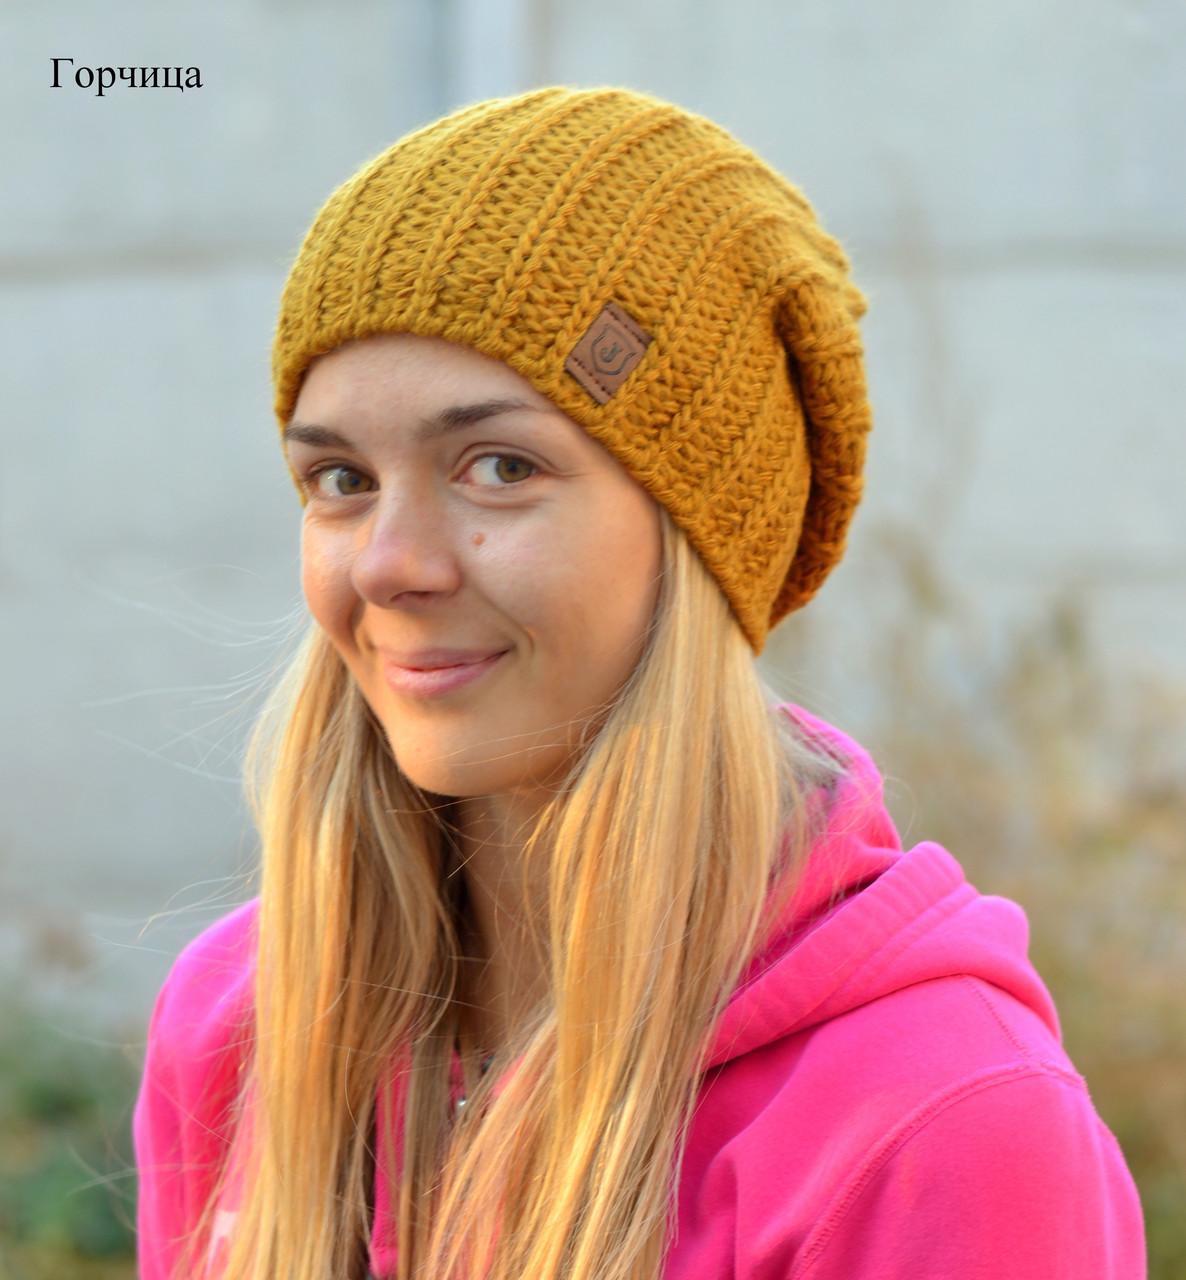 http://images.ua.prom.st/242473936_w640_h640_dsc_0711.jpg